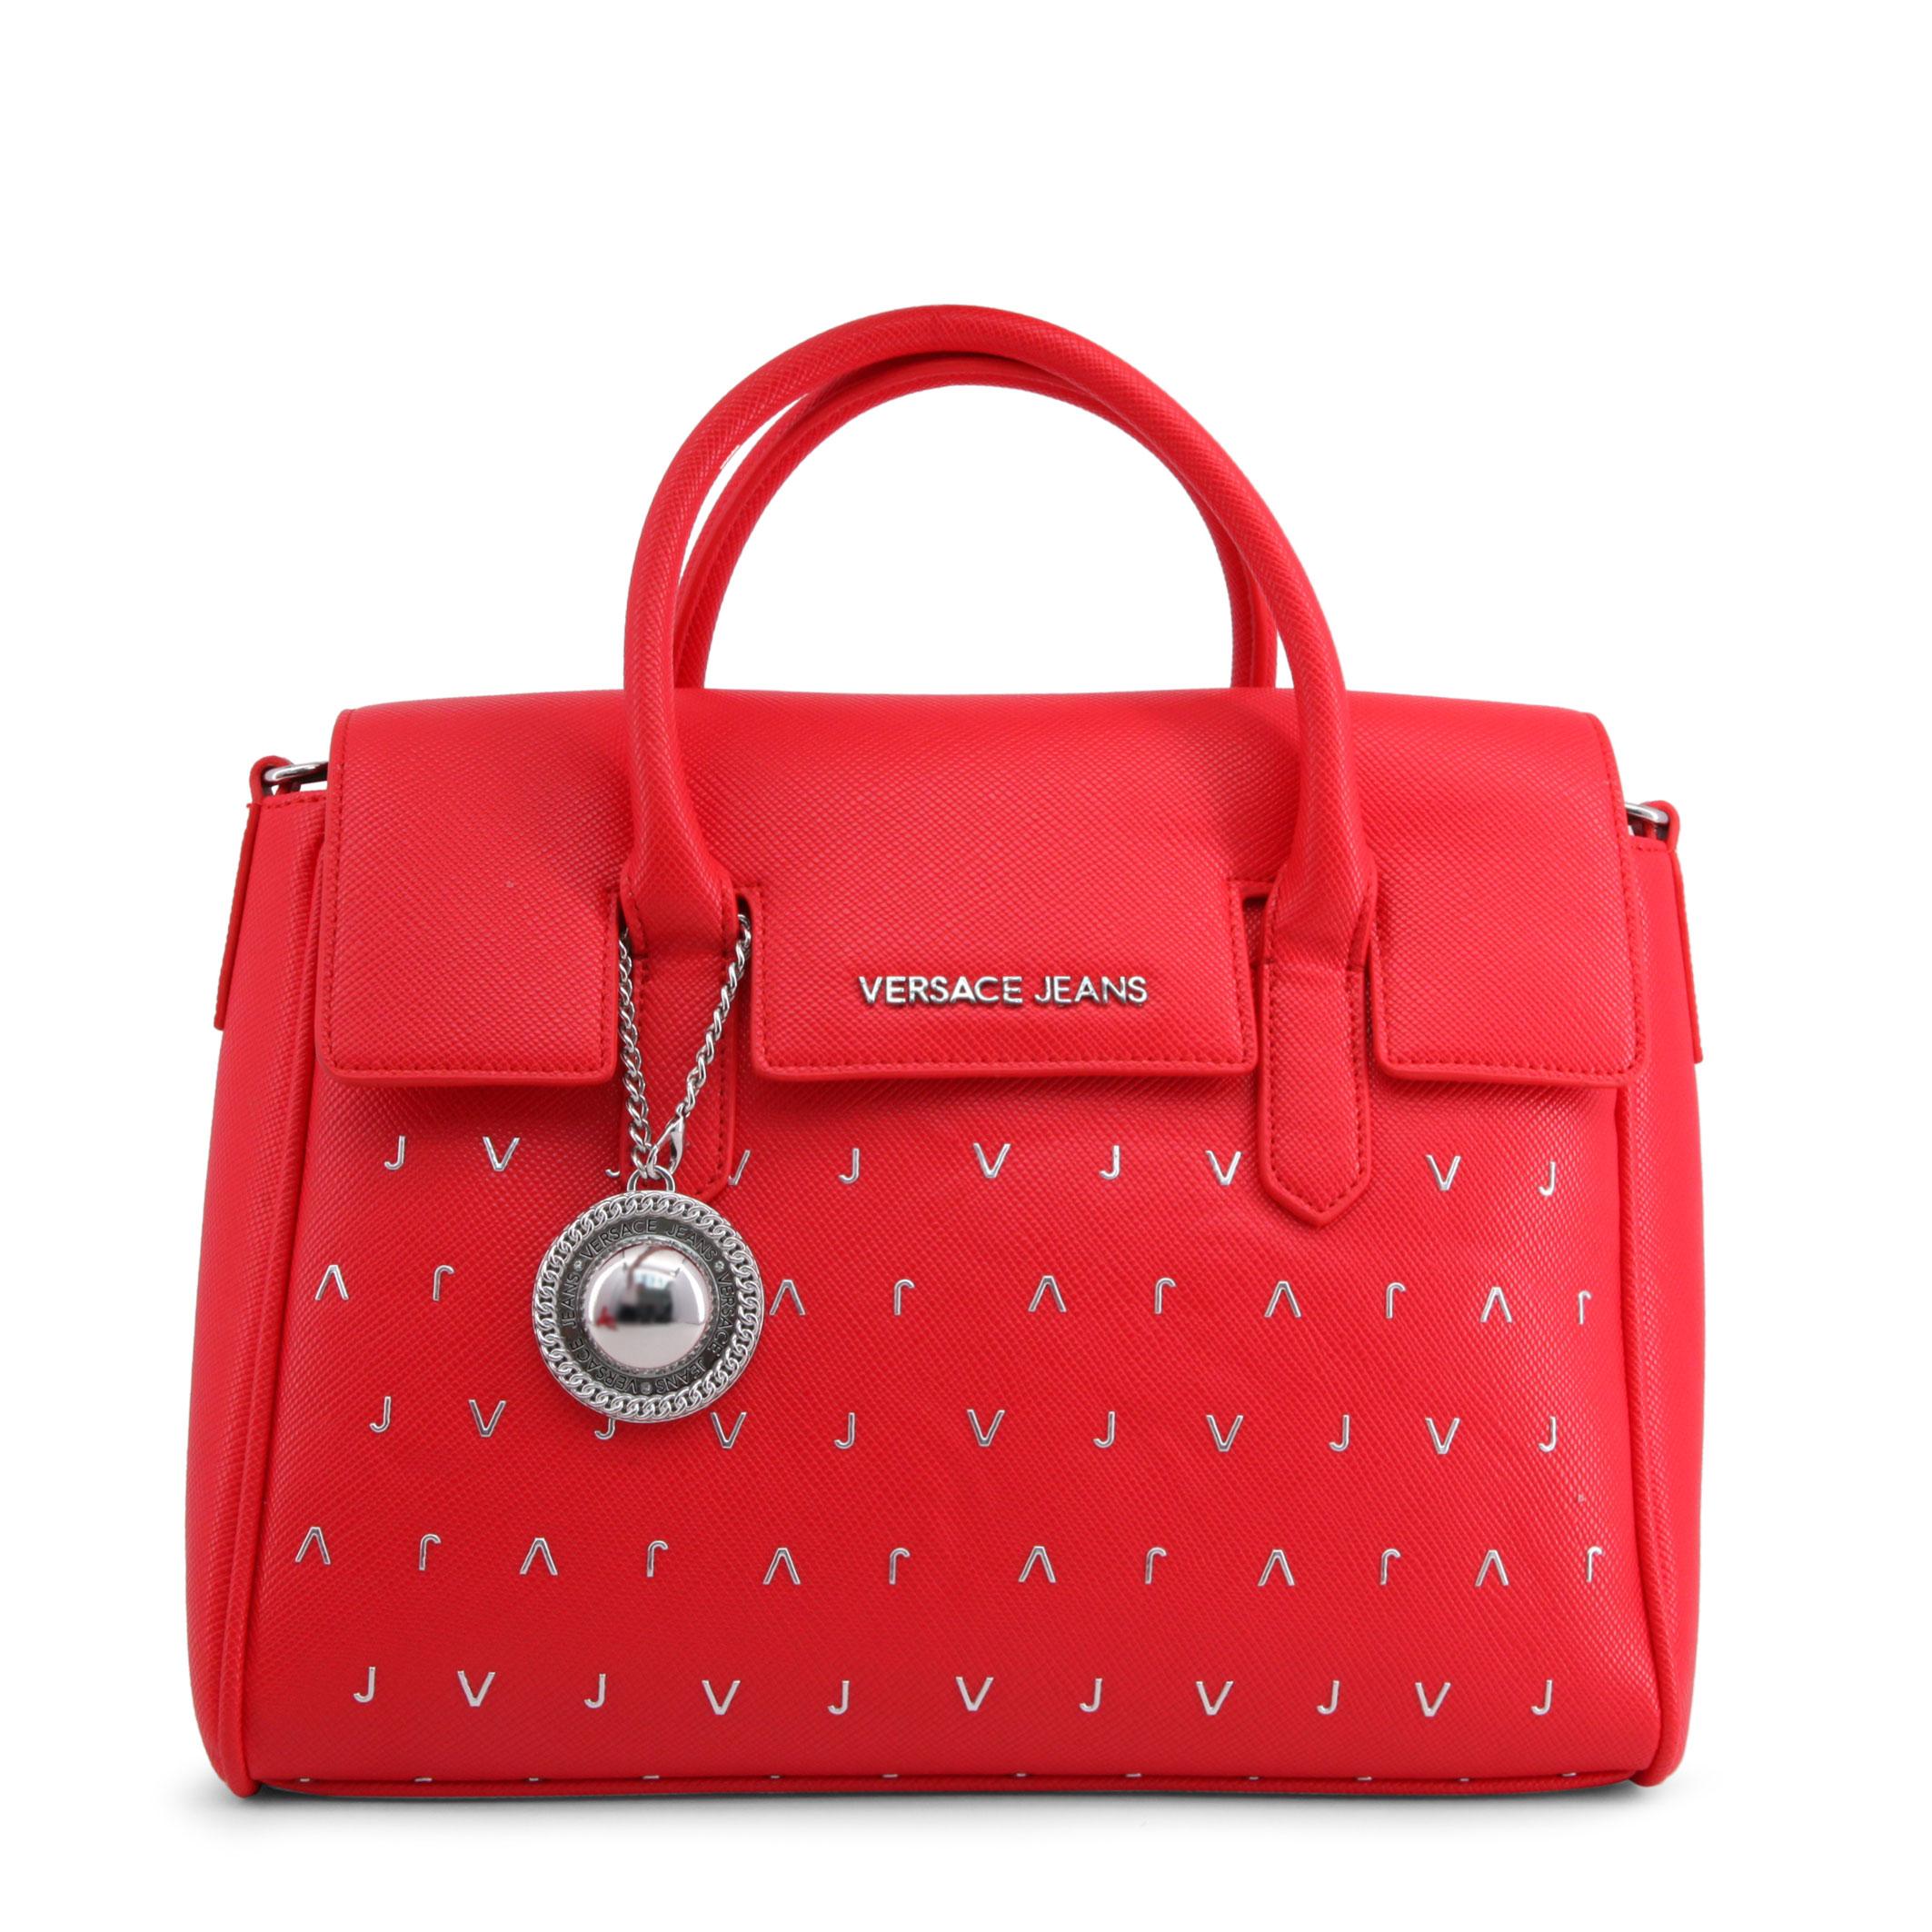 Fashion express handbags wholesale 100